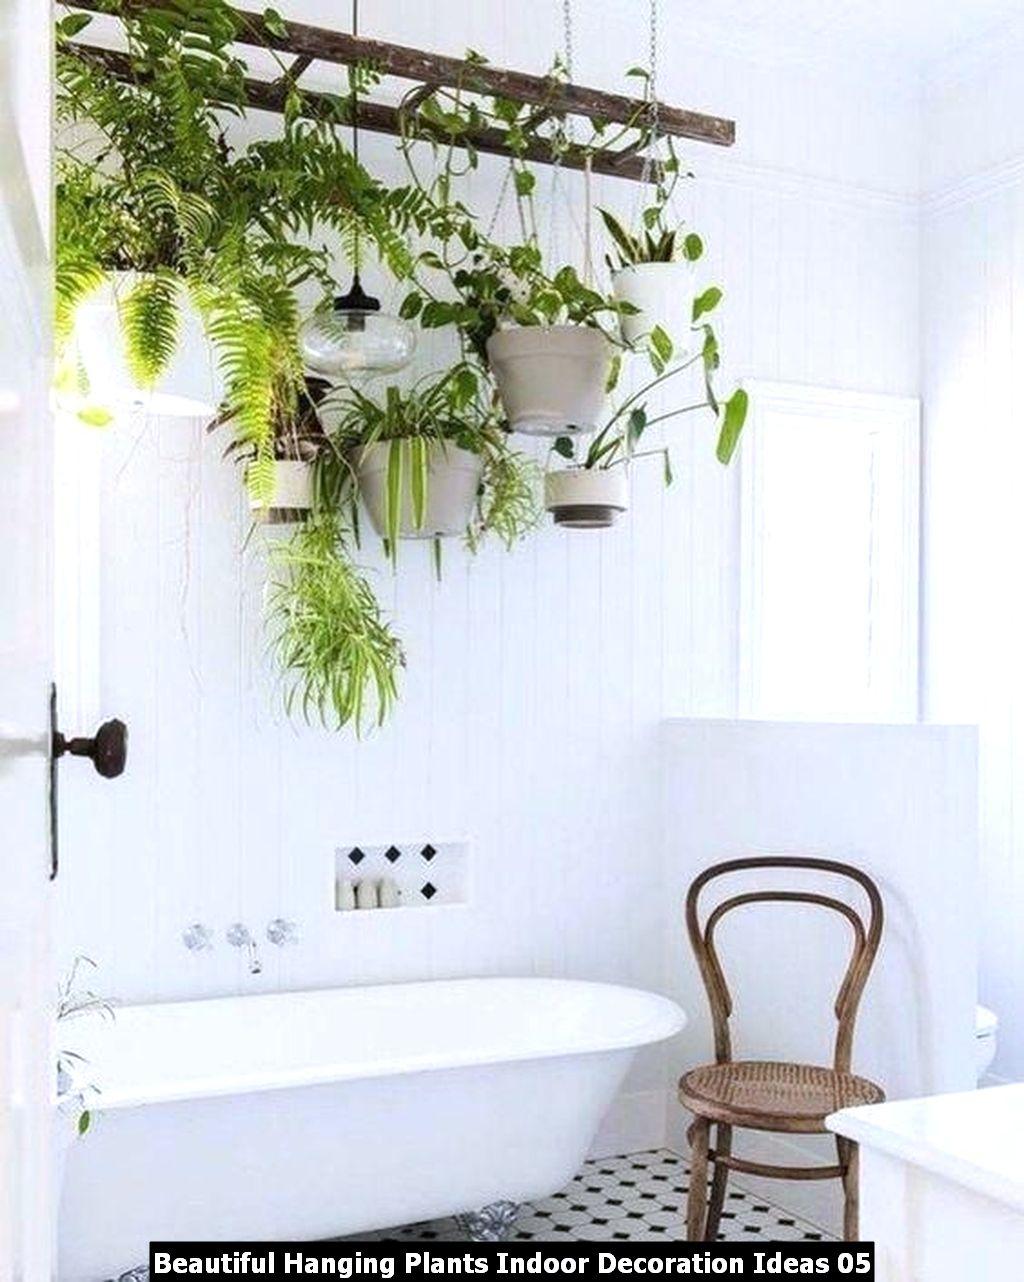 Beautiful Hanging Plants Indoor Decoration Ideas 05